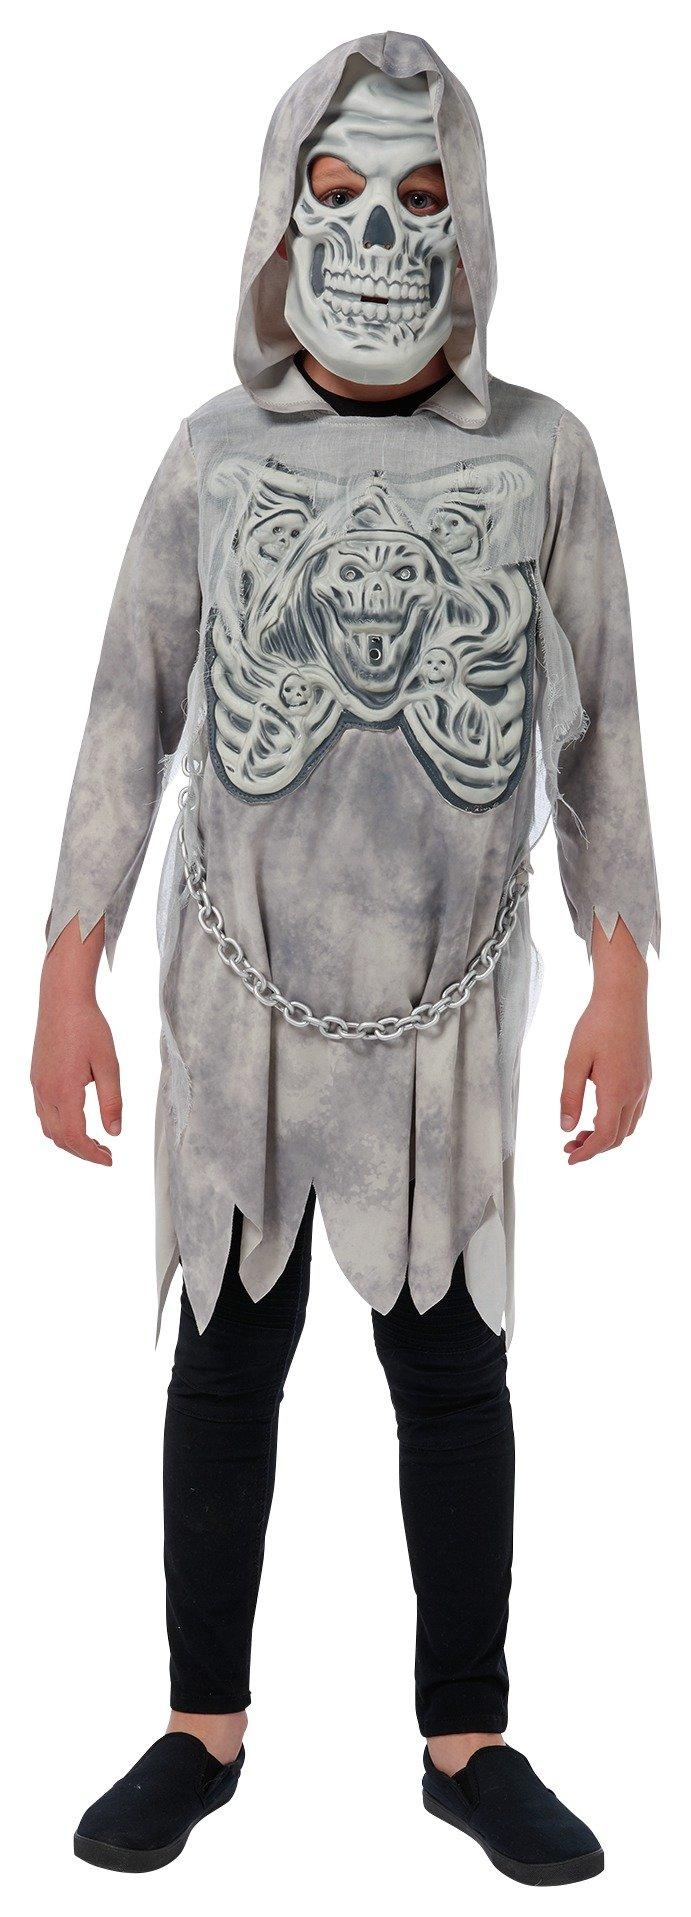 Image of Ghost Reaper Fancy Dress Costume - 7-8 Years.